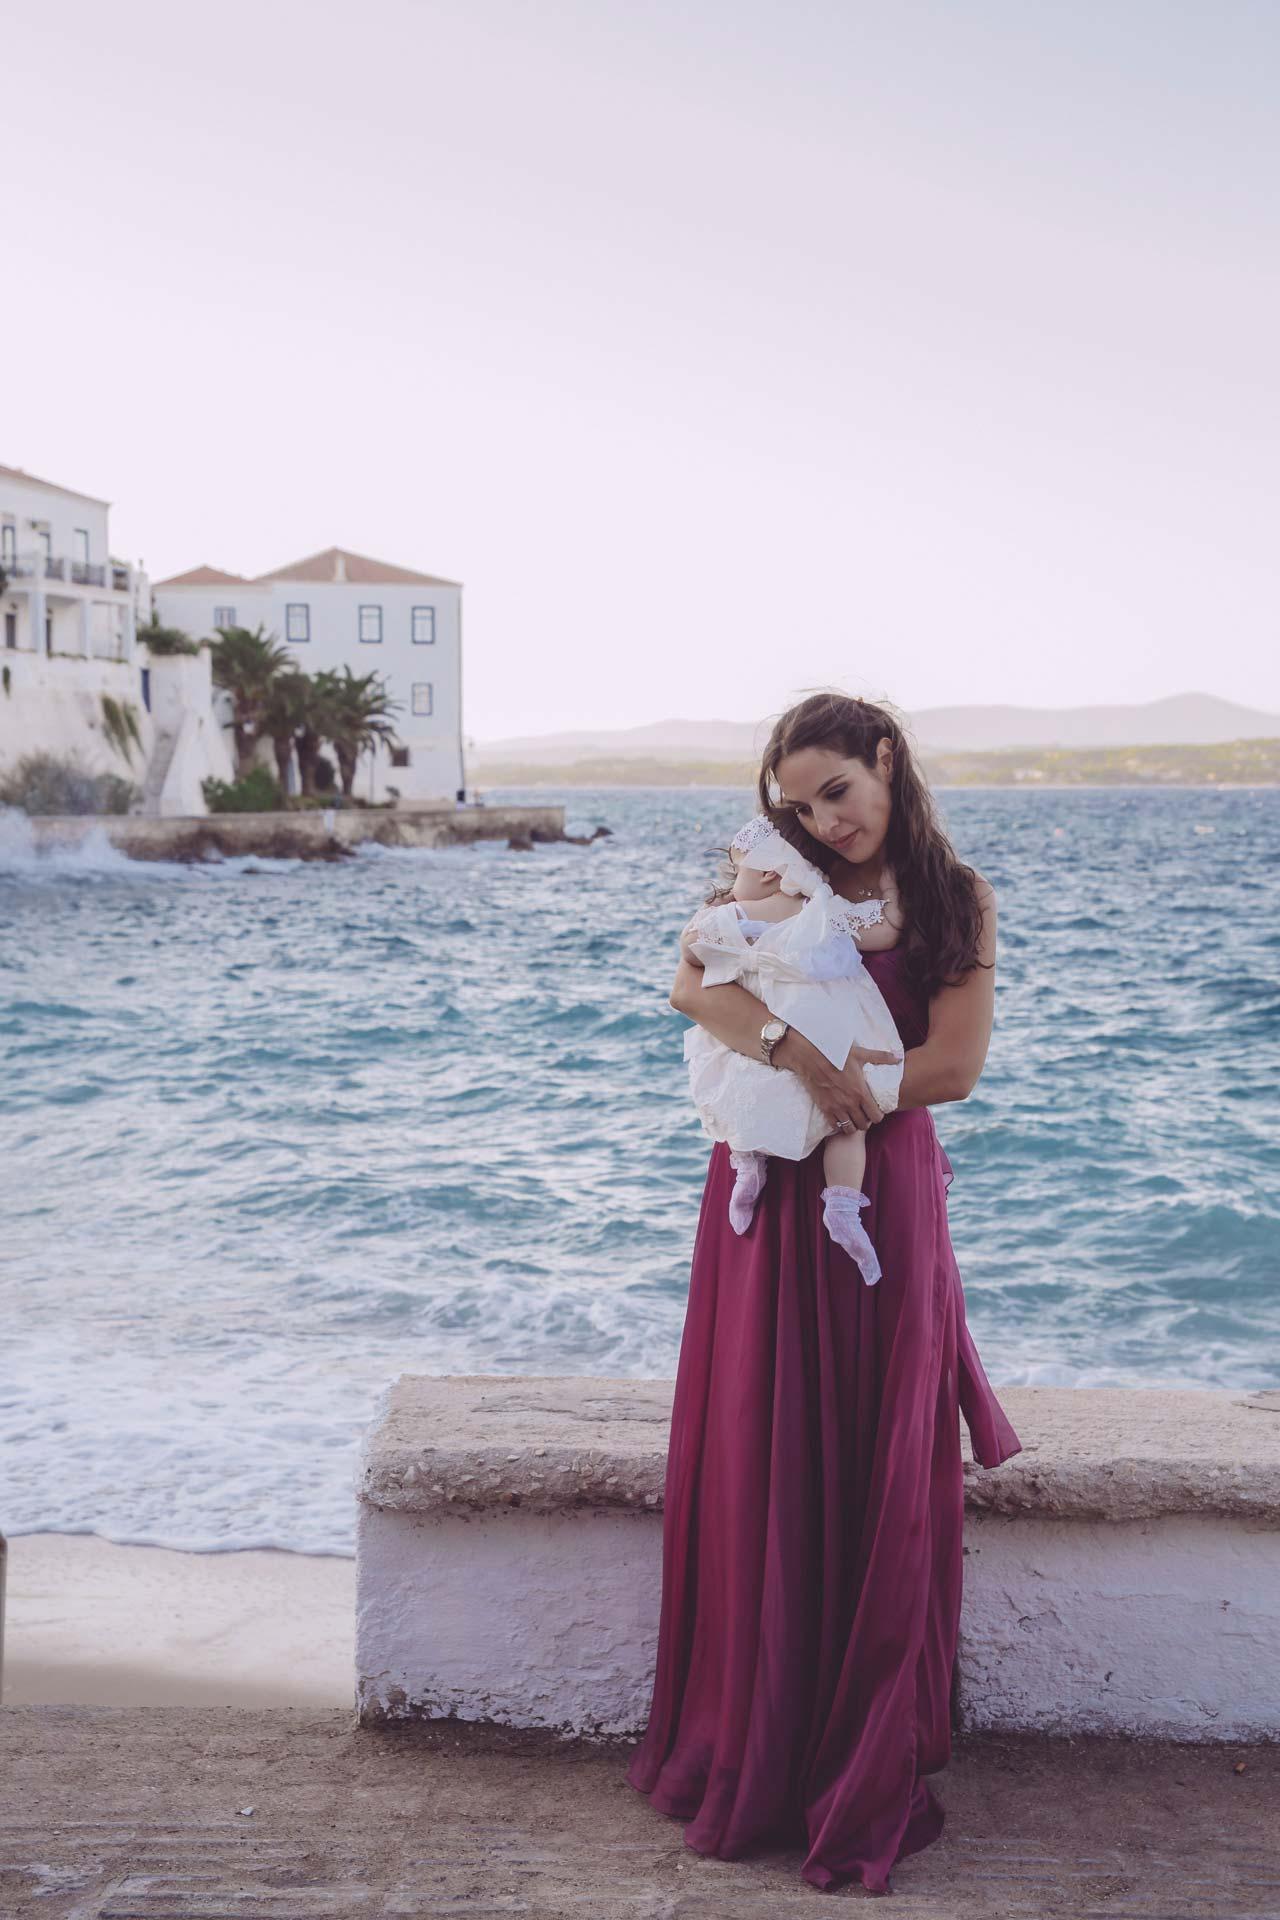 585 PhotoVaptisis βαπτιση σπετσεσ φωτογραφοσ vaptisi koritsi agios nikolaos spestes island photographer